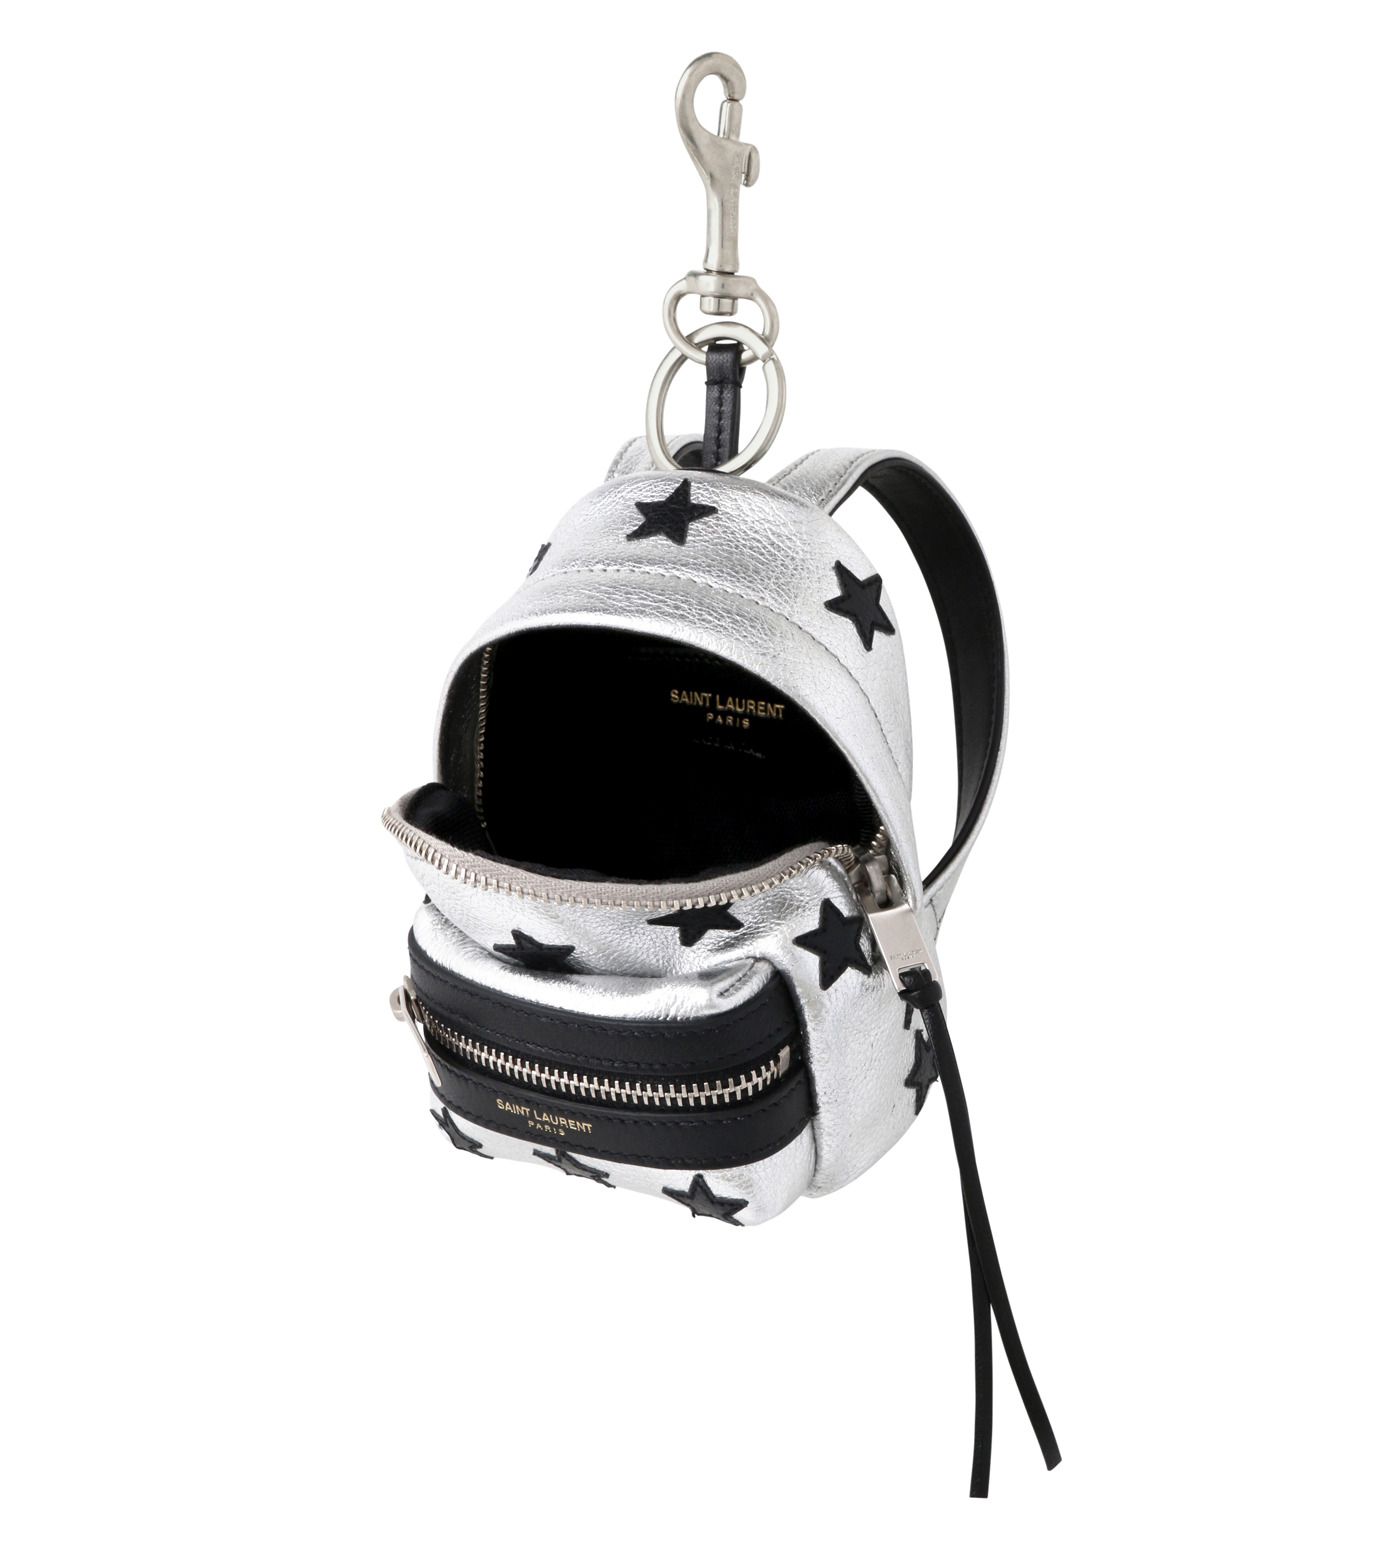 SAINT LAURENT(サンローラン)のSilver Star Mini-SILVER-441914-BSZA6-1 拡大詳細画像2